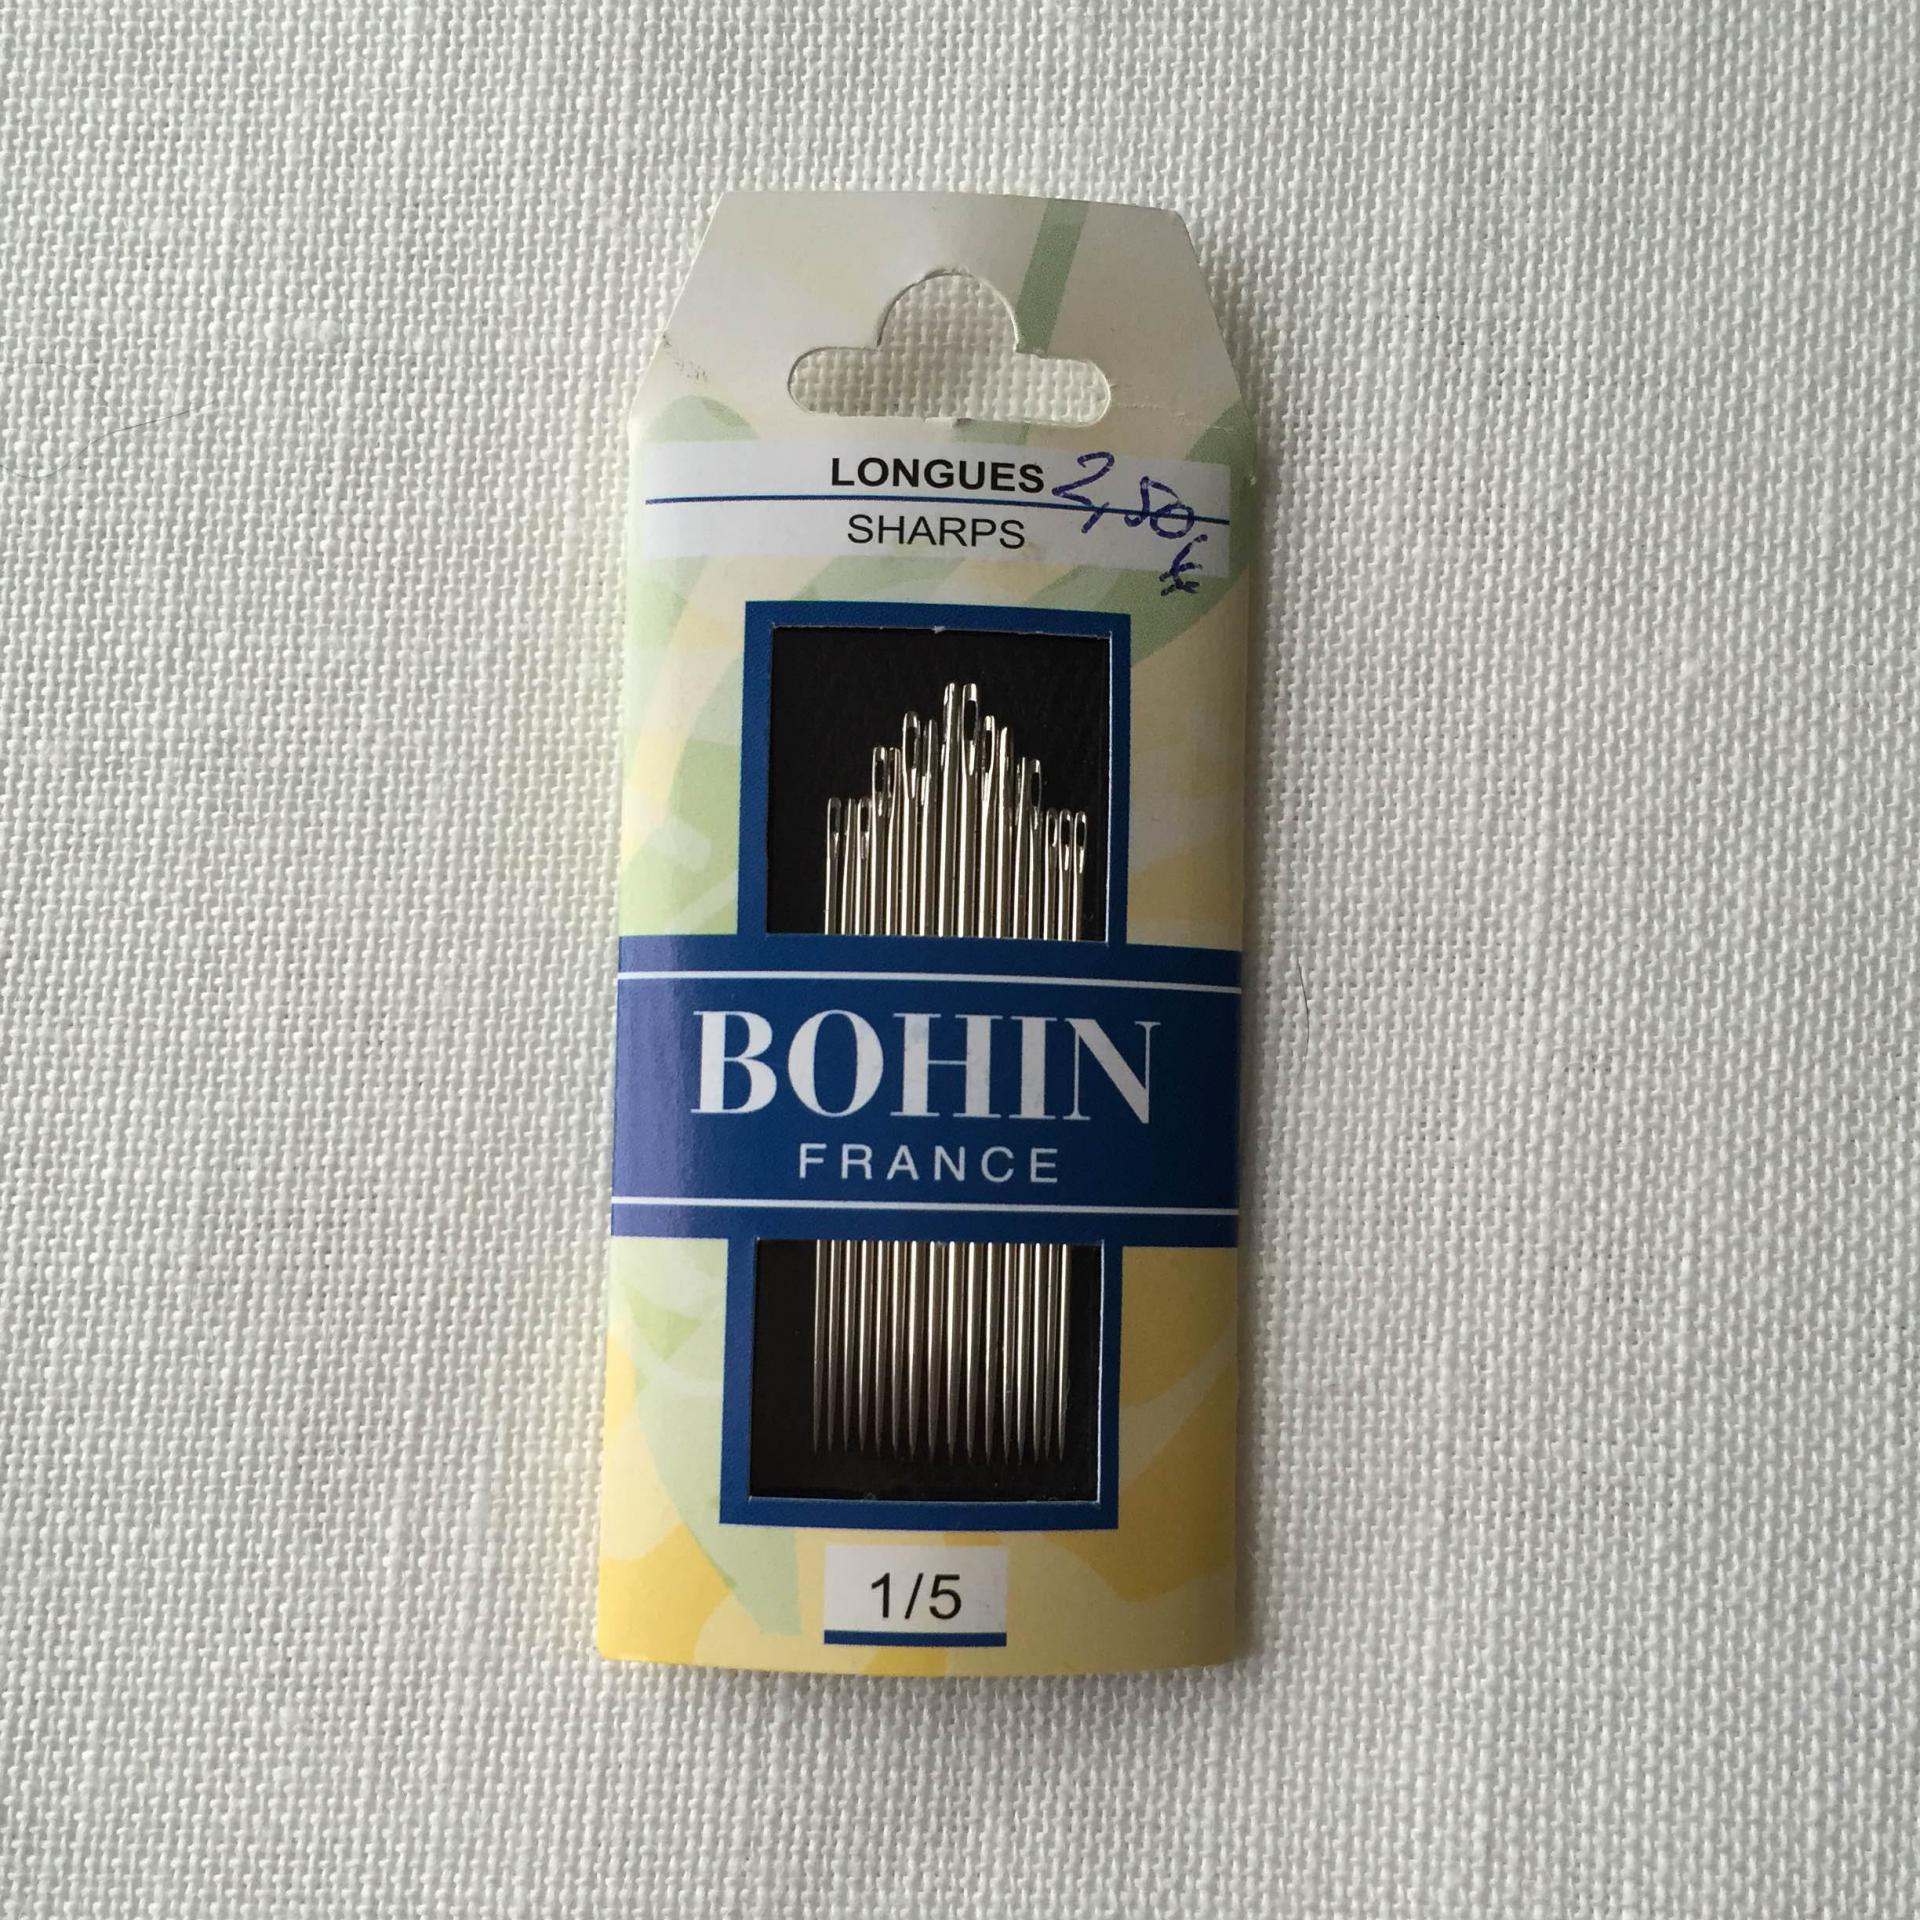 Bohin 1 5